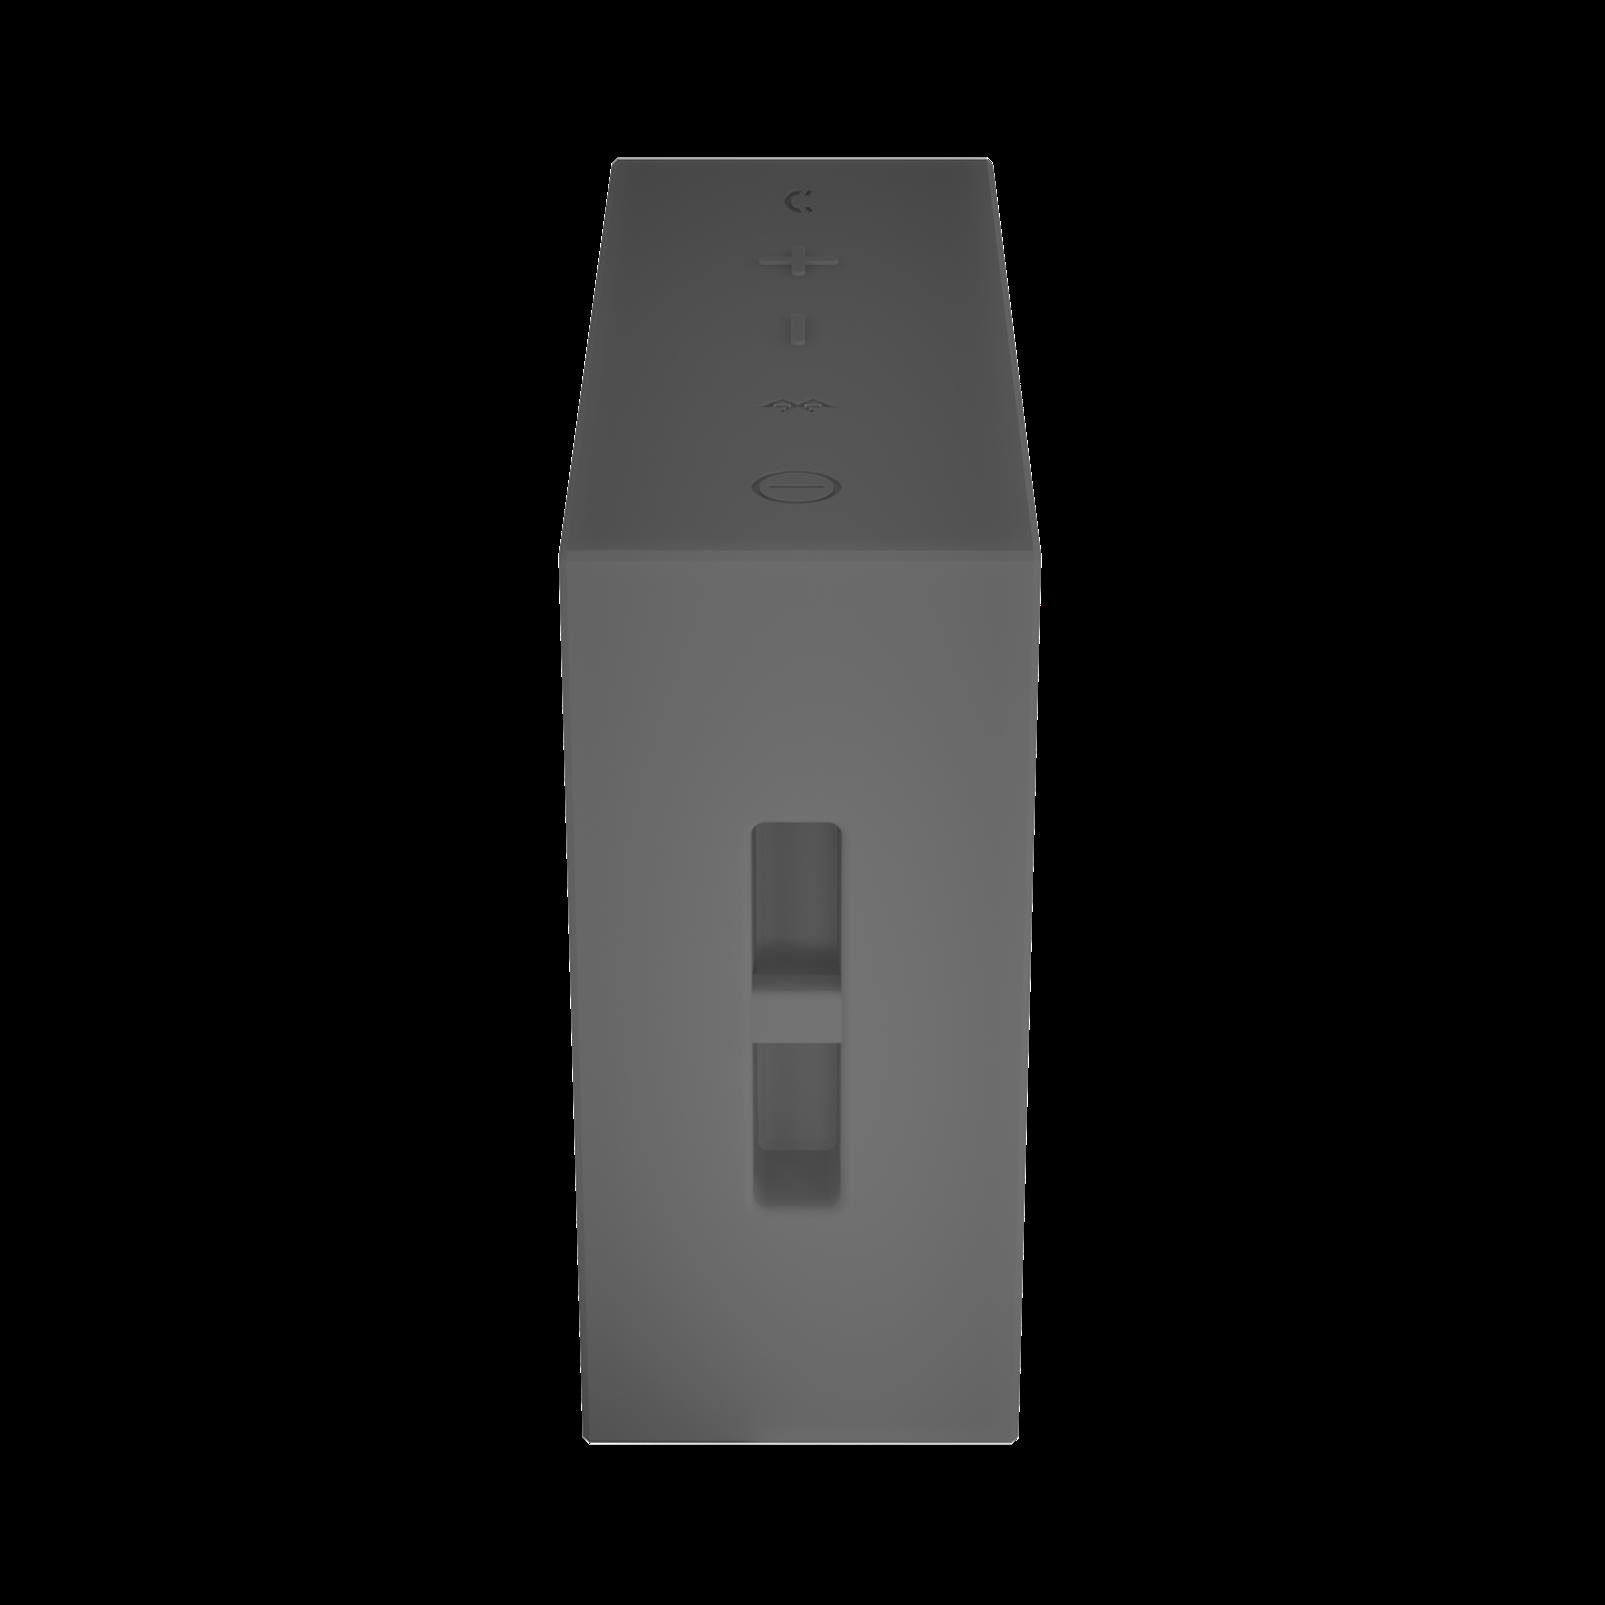 Jbl Go Portable Mini Bluetooth Speaker Harman Kardon Play Hitam